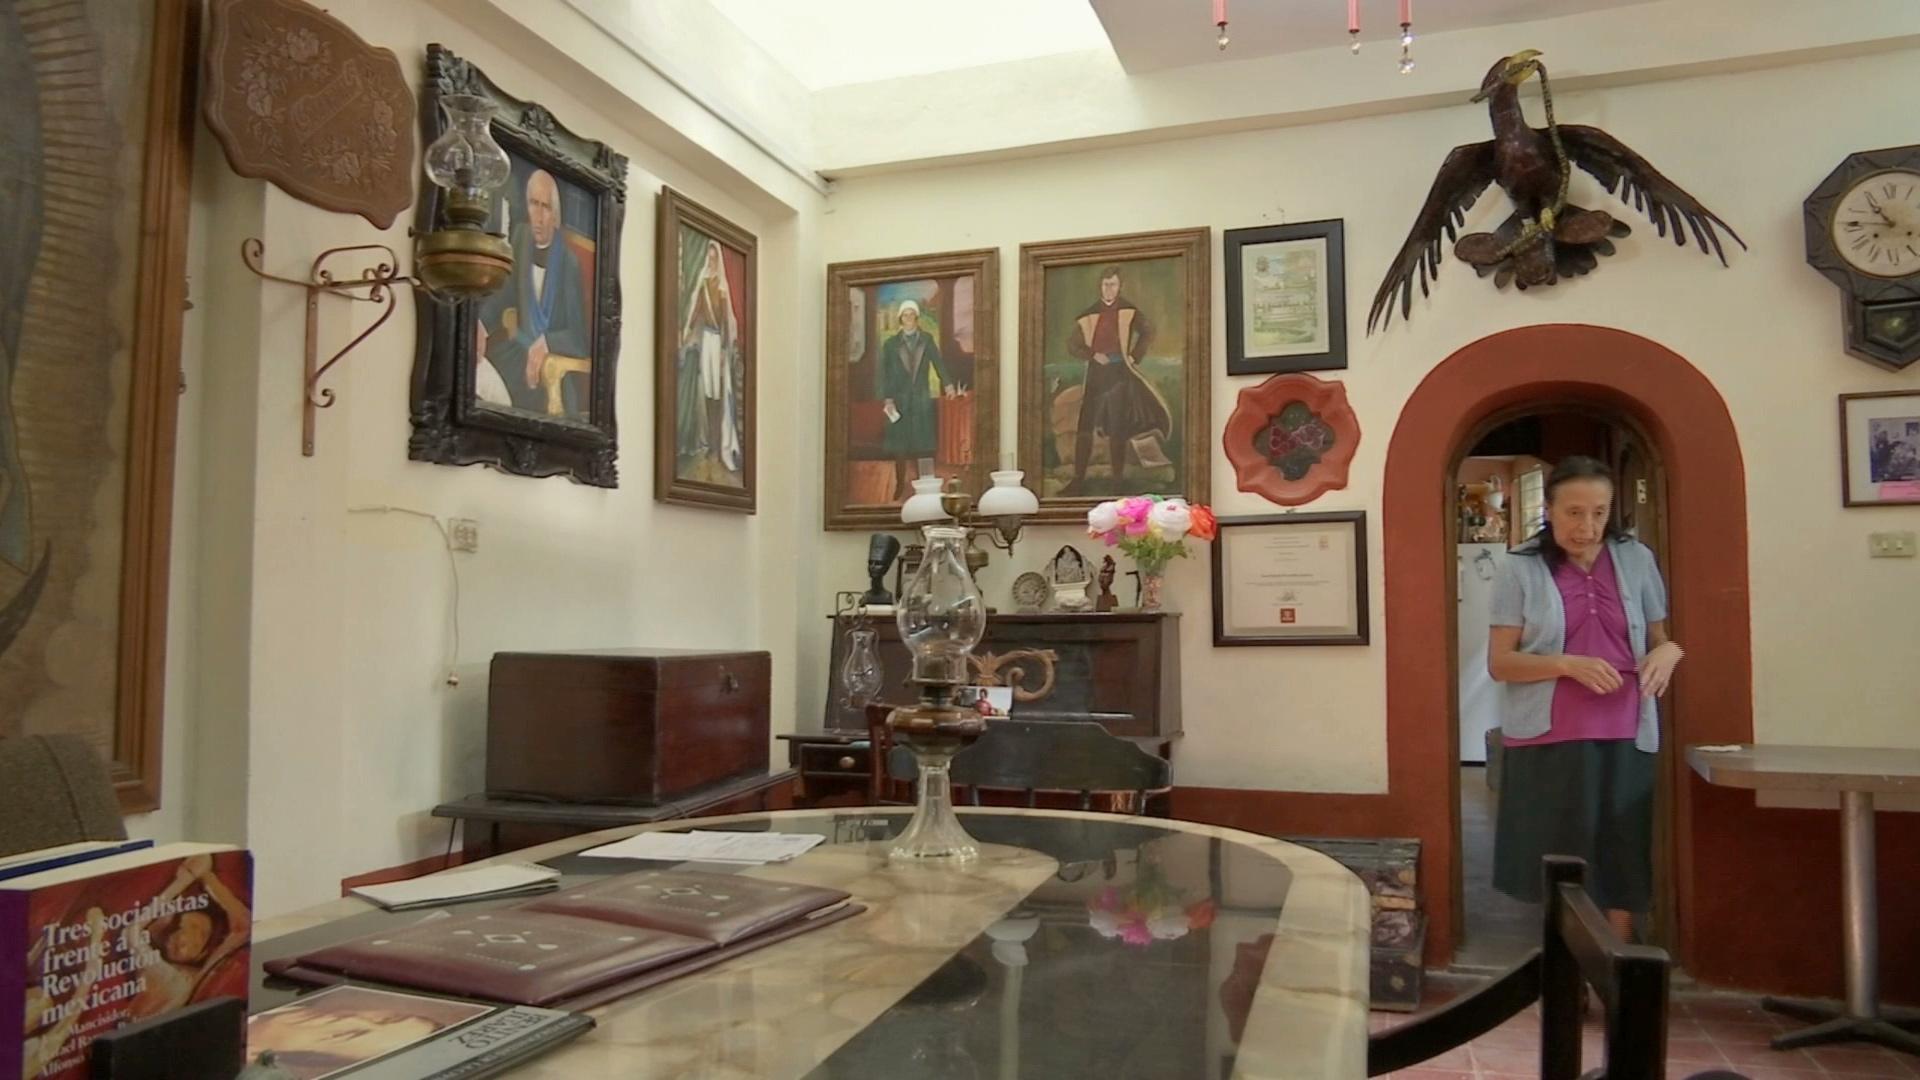 Casa de la cultura de Banderilla invita a sus talleres permanentes